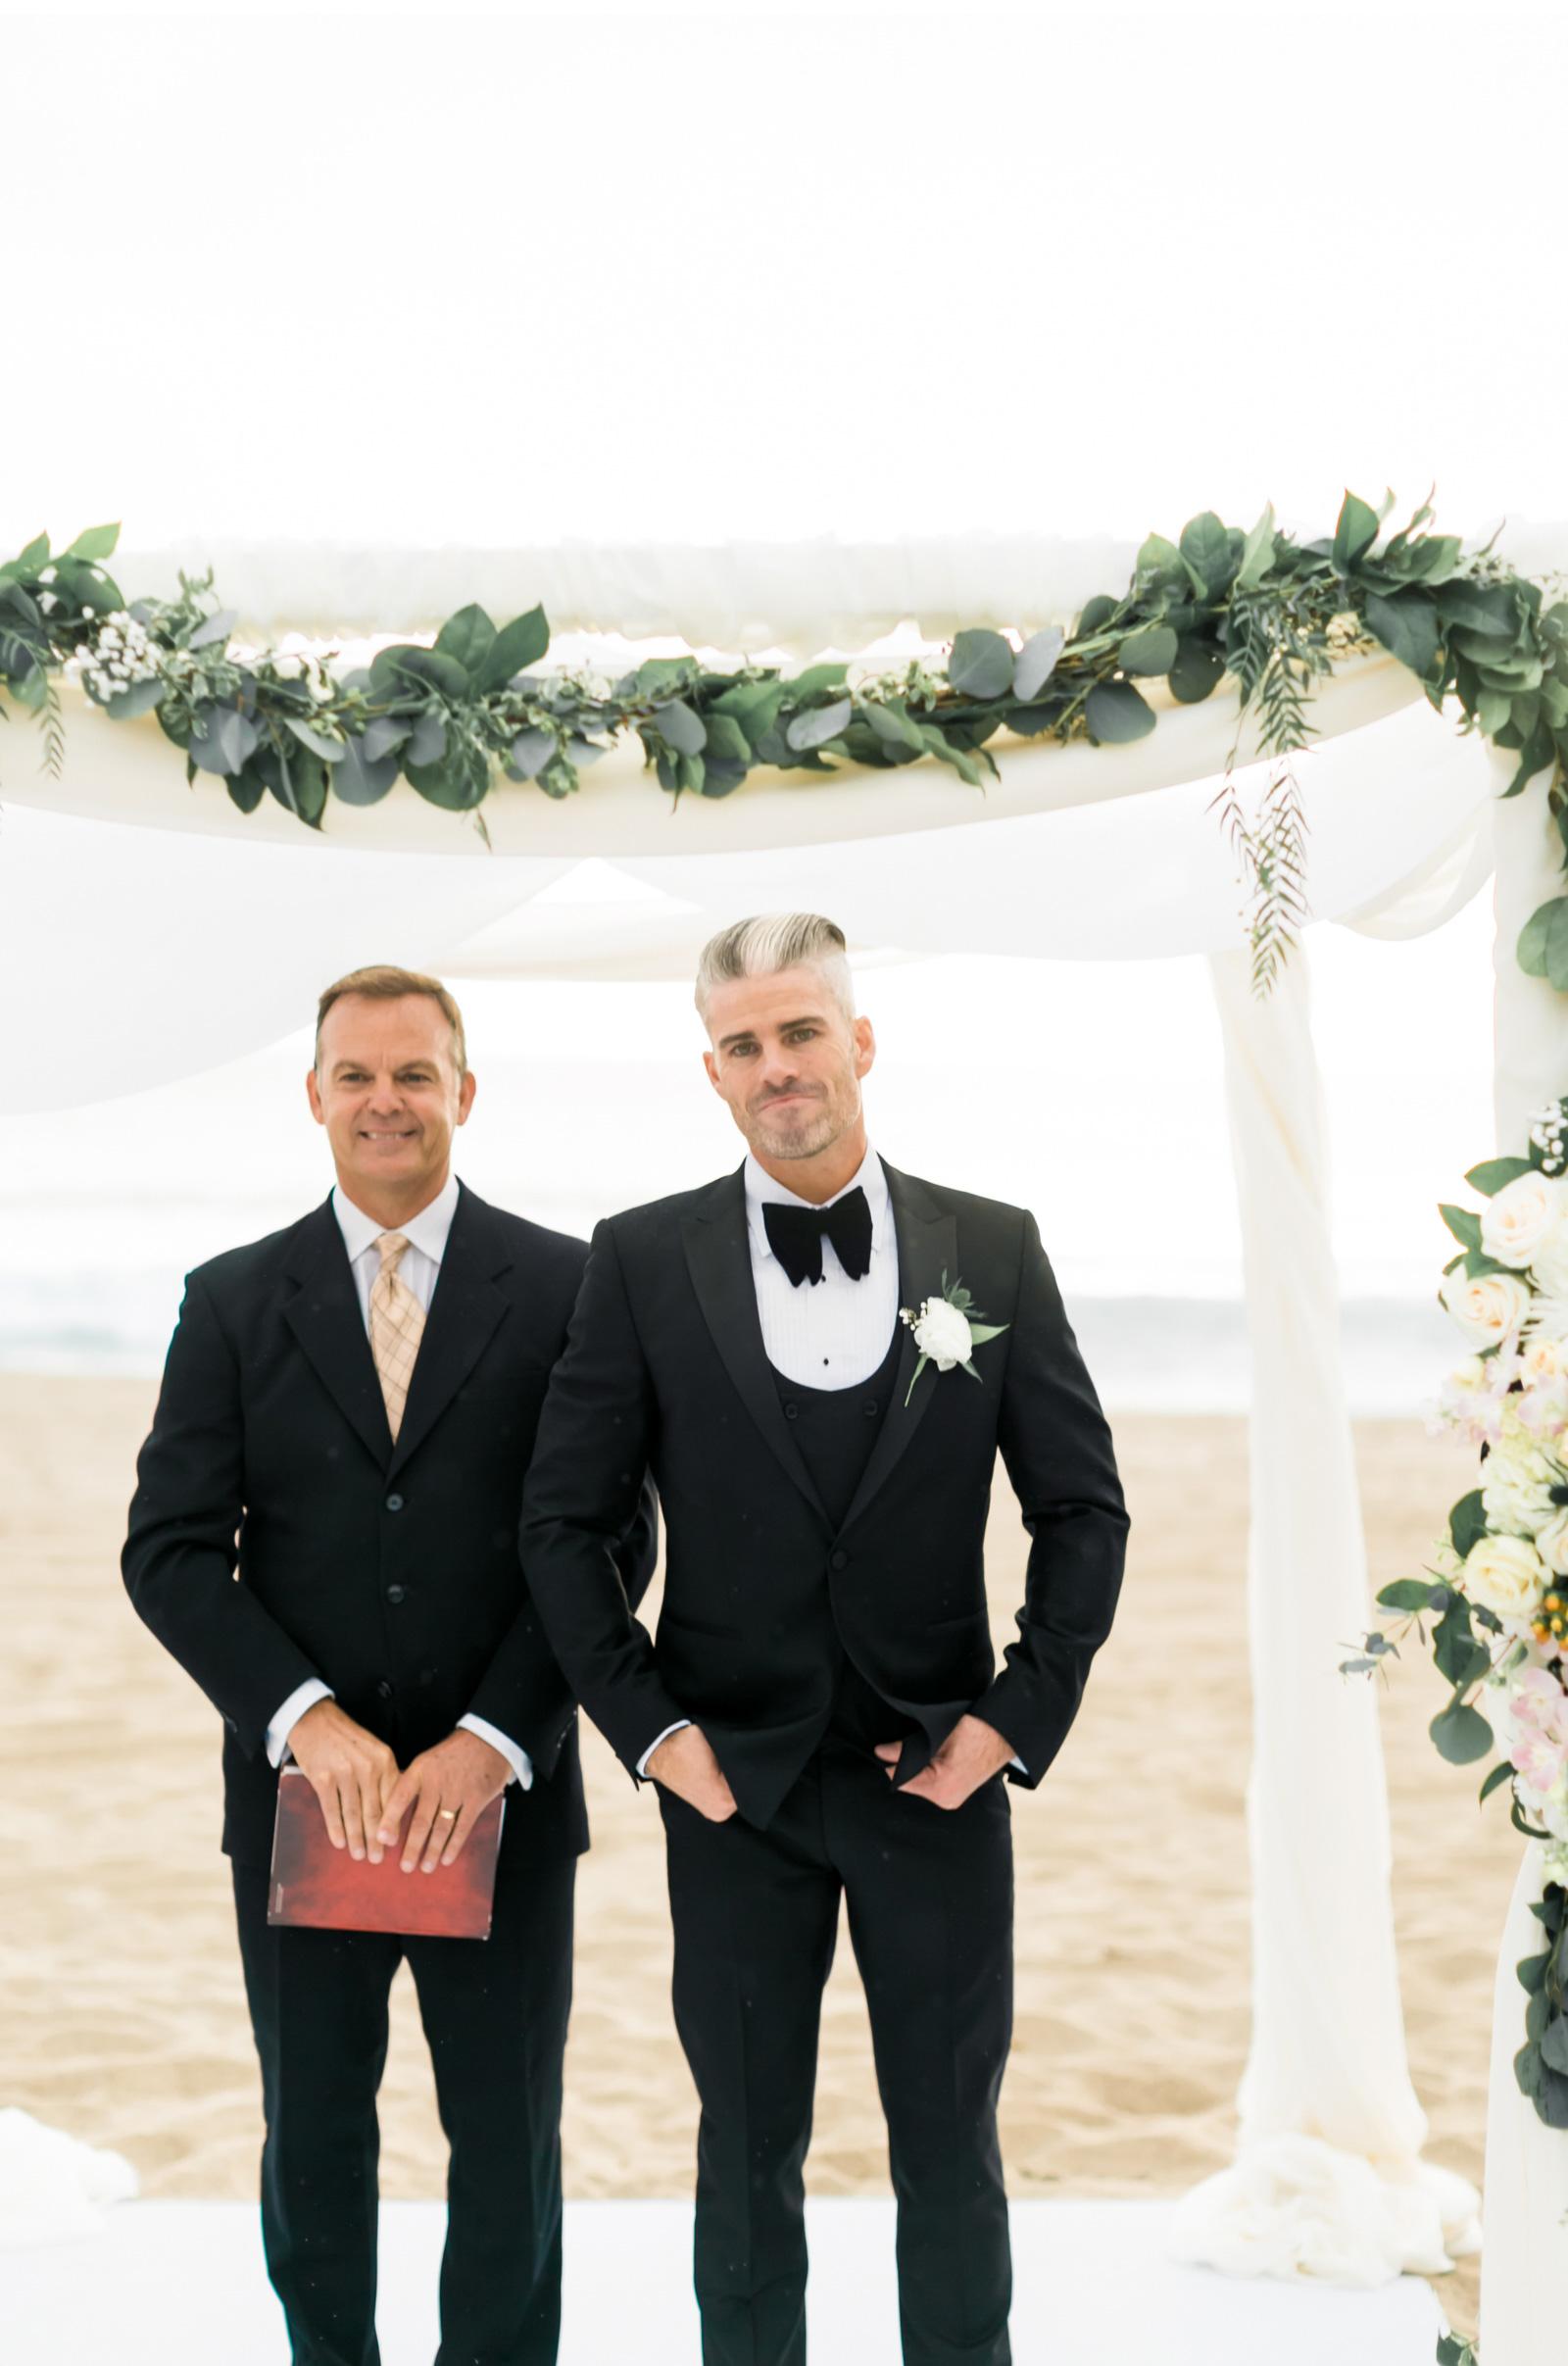 Malibu-Wedding-Natalie-Schutt-Photography-Style-Me-Pretty_07.jpg